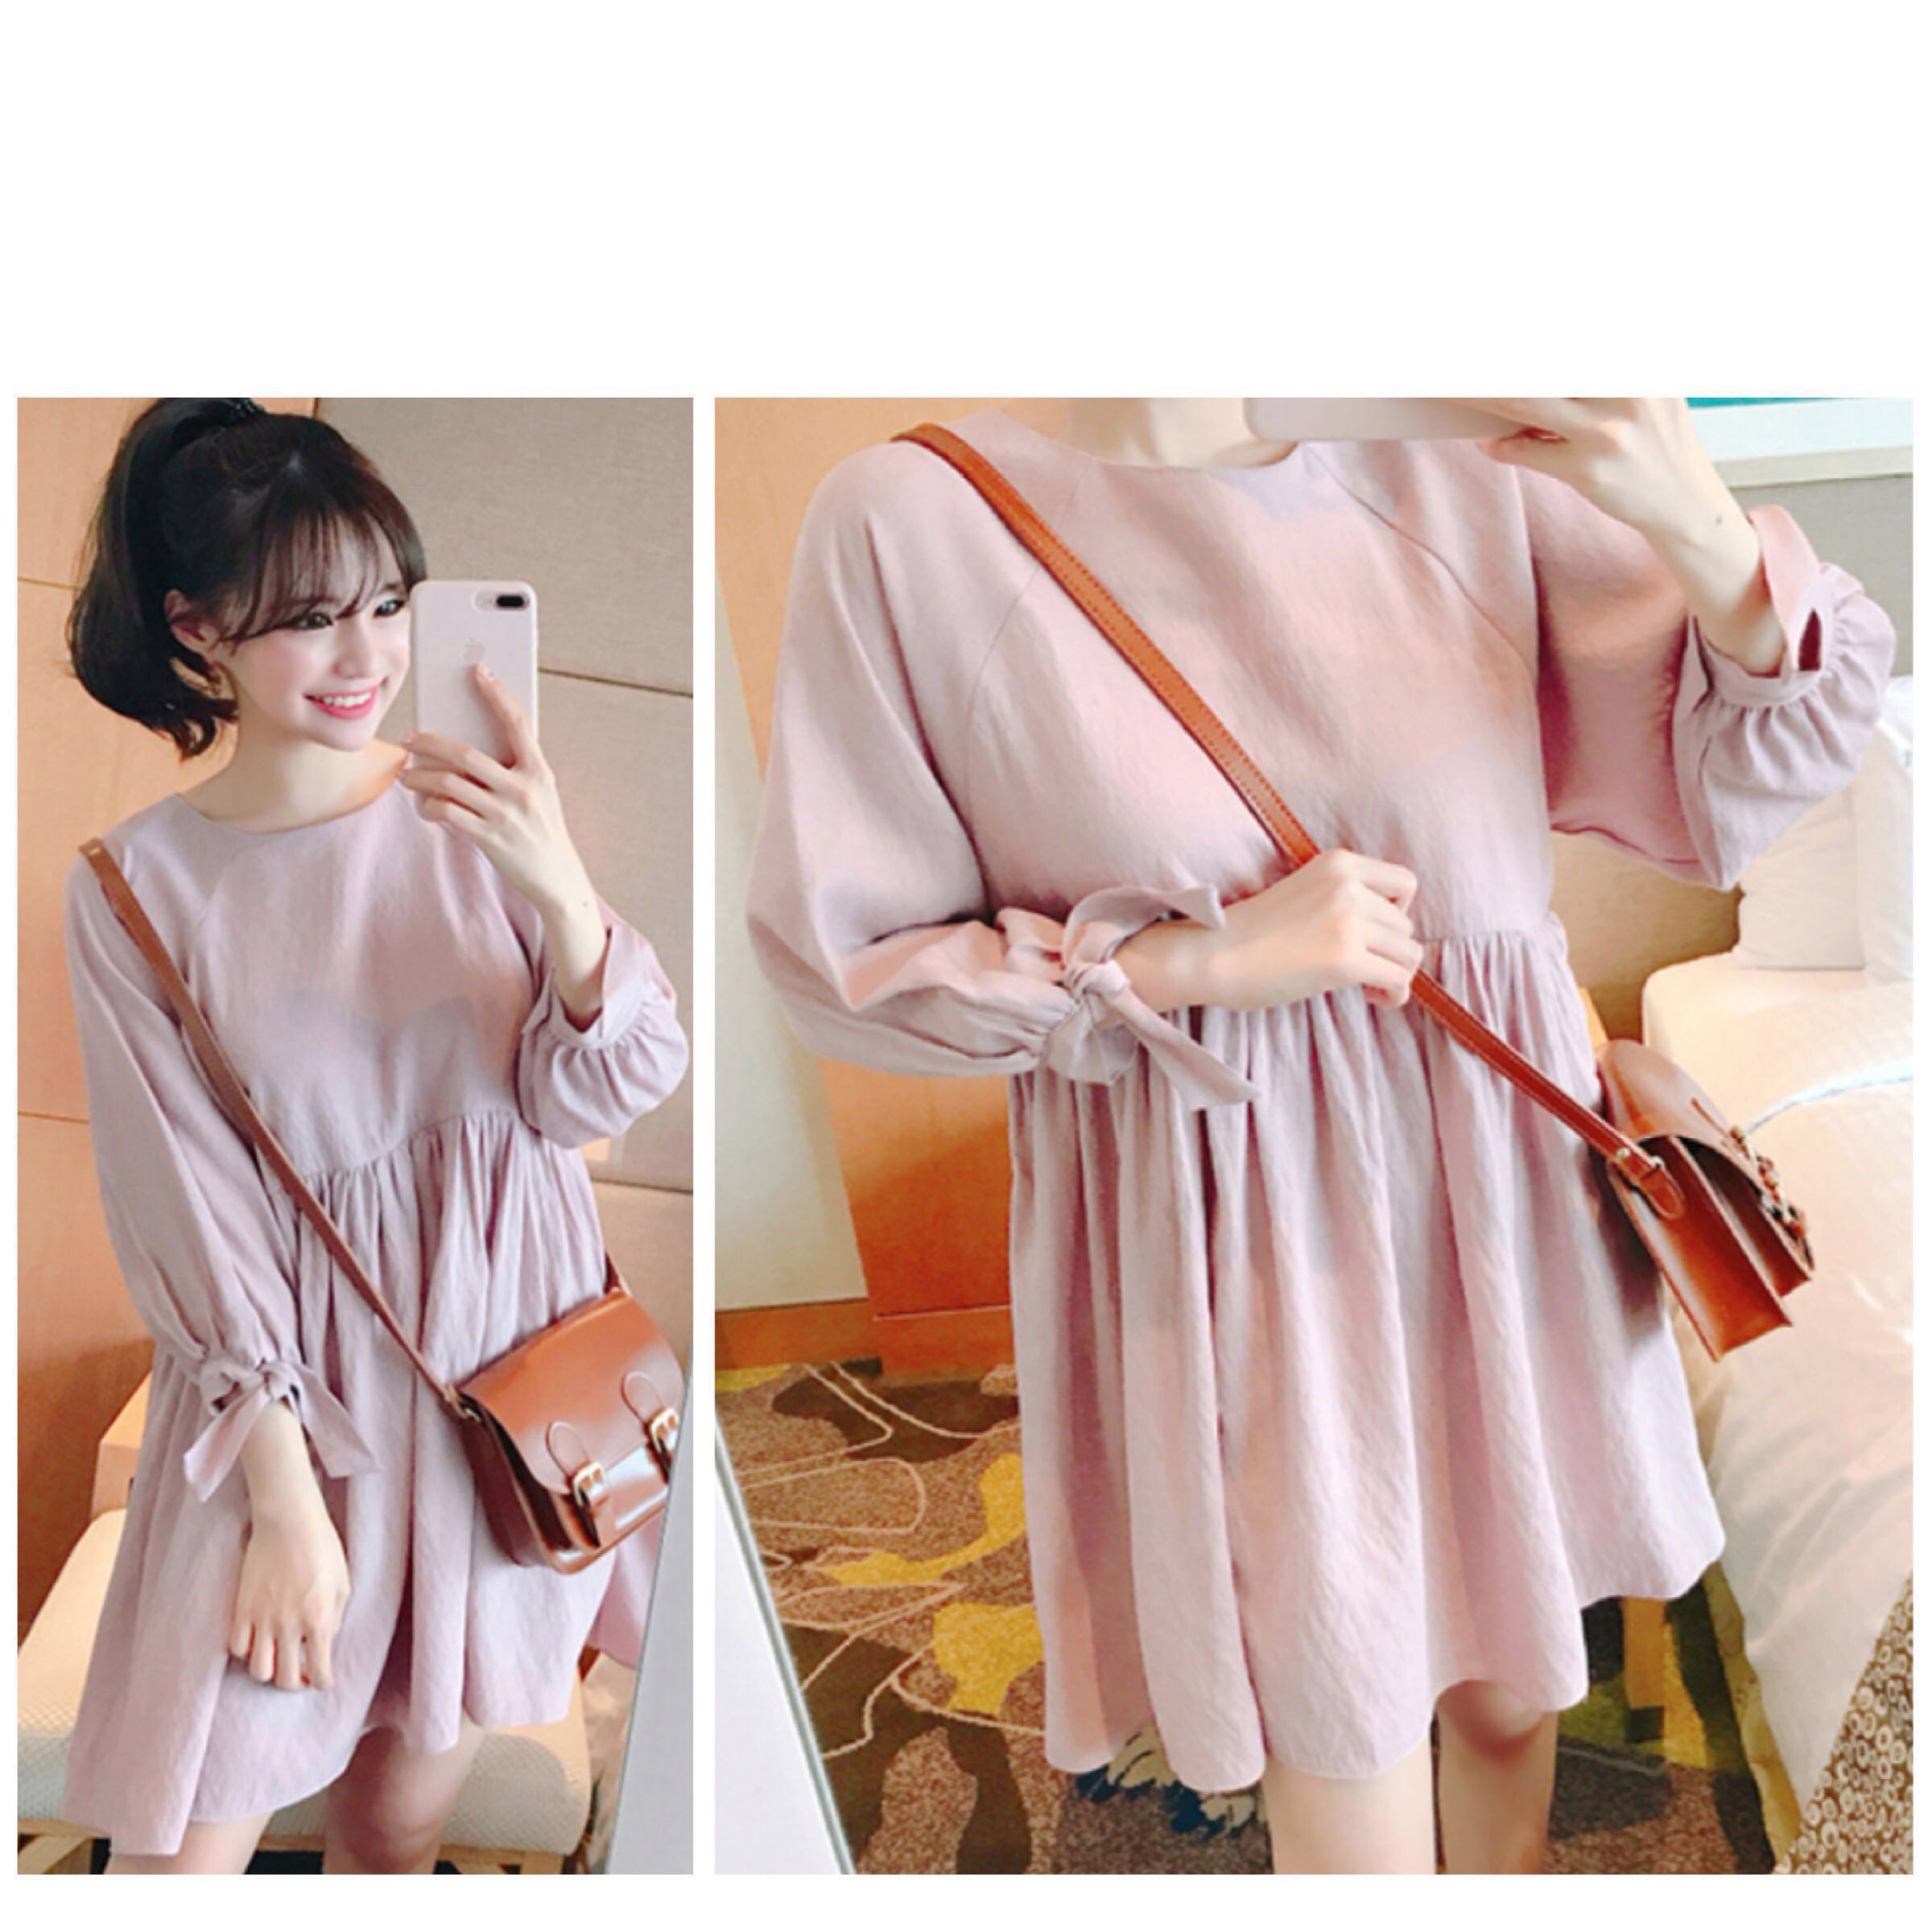 bd6489d3925 ✨BNIB BNWT Korean Babydoll Dress with Long sleeves ✨Lovely Sweet ...